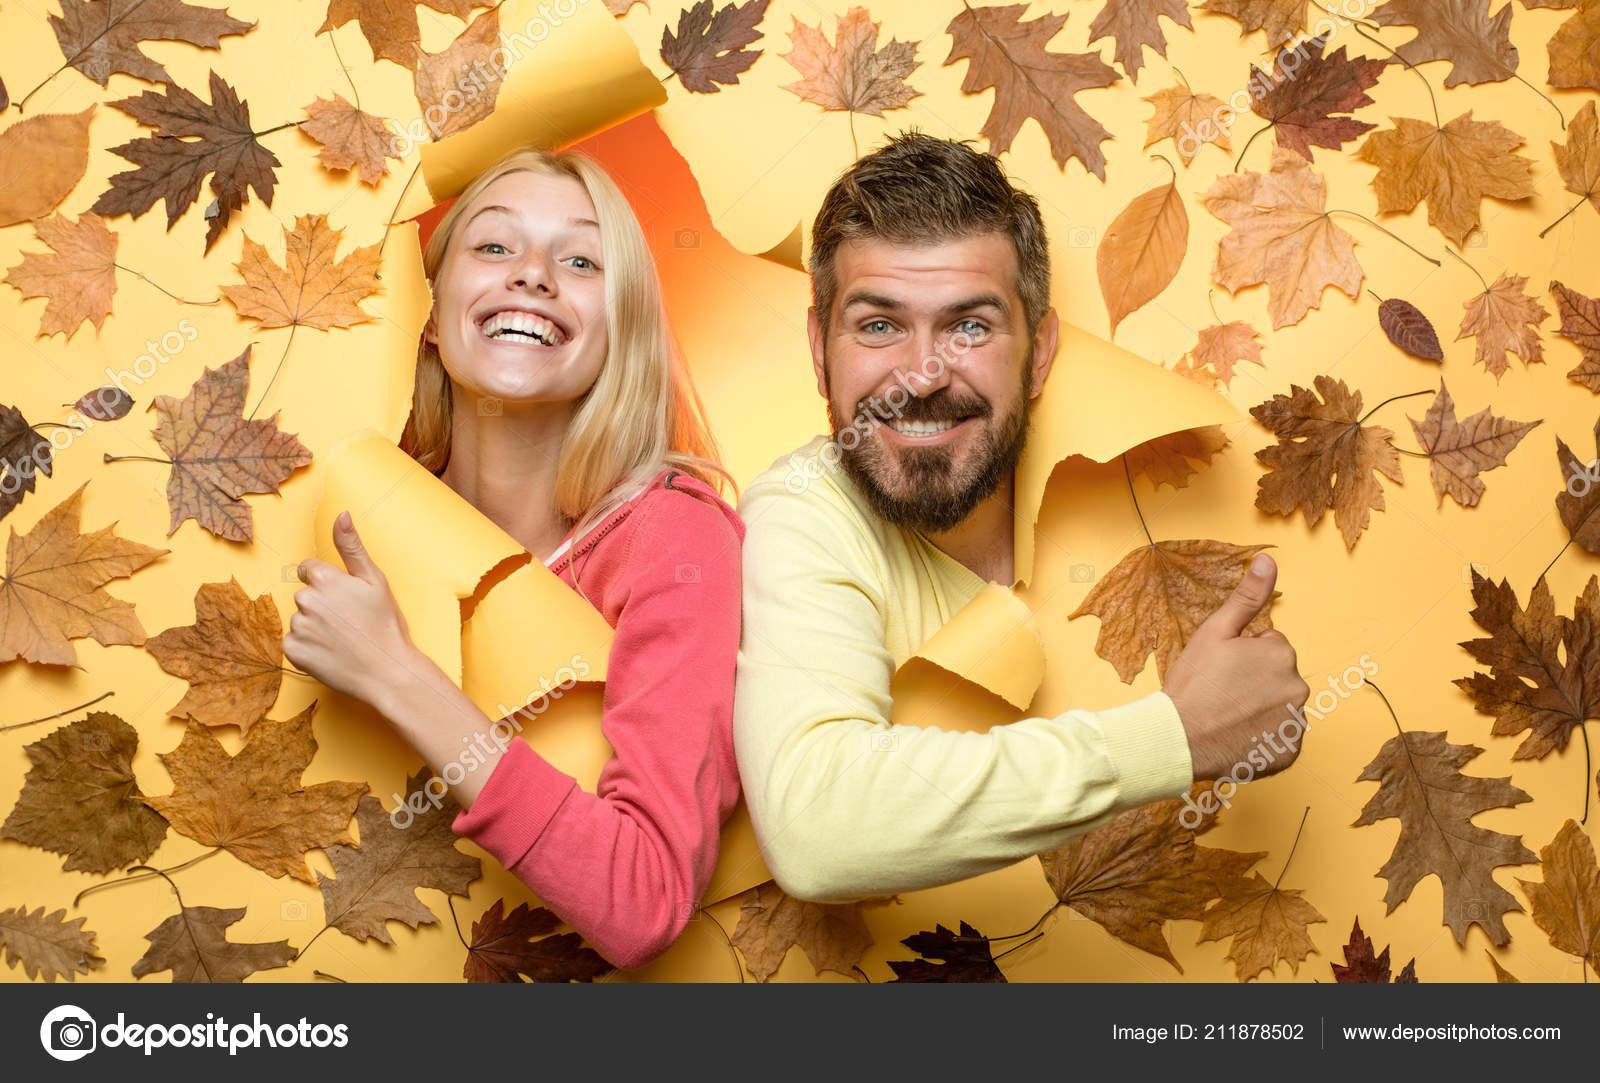 dating διαφήμιση να συνδέσουμε τον πολιτισμό και τον γάμο